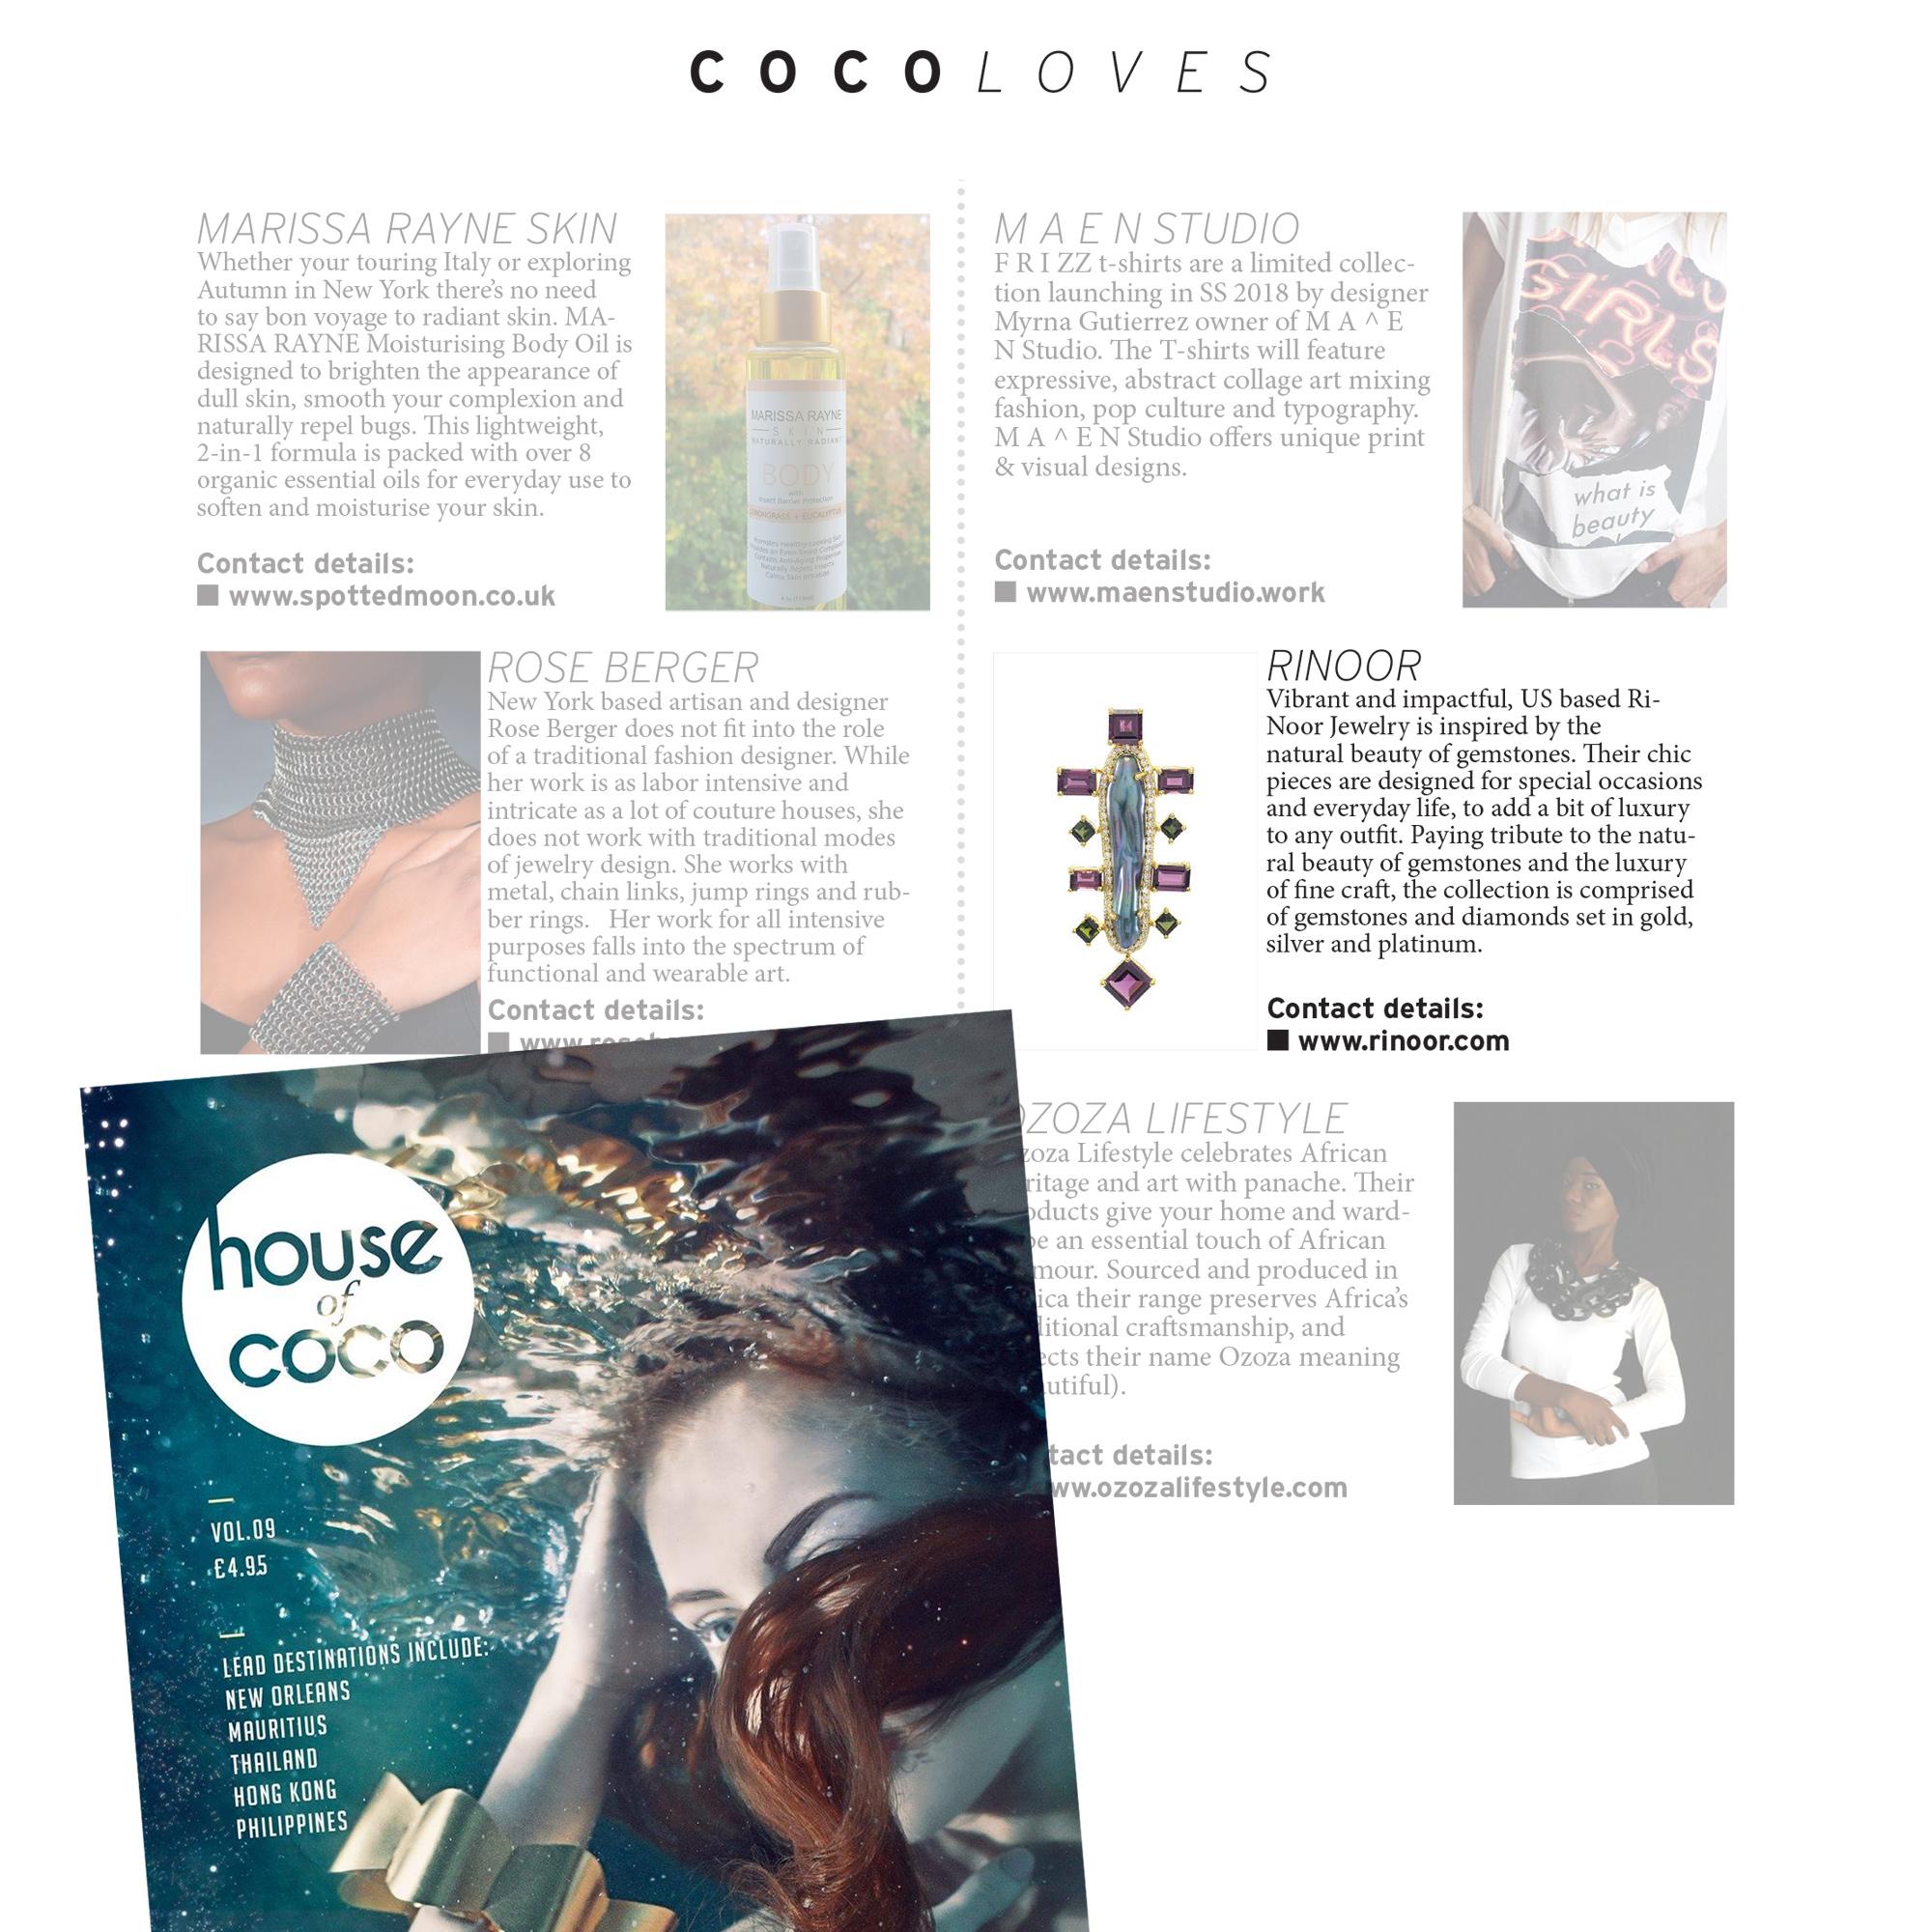 House of Coco, Volume 9